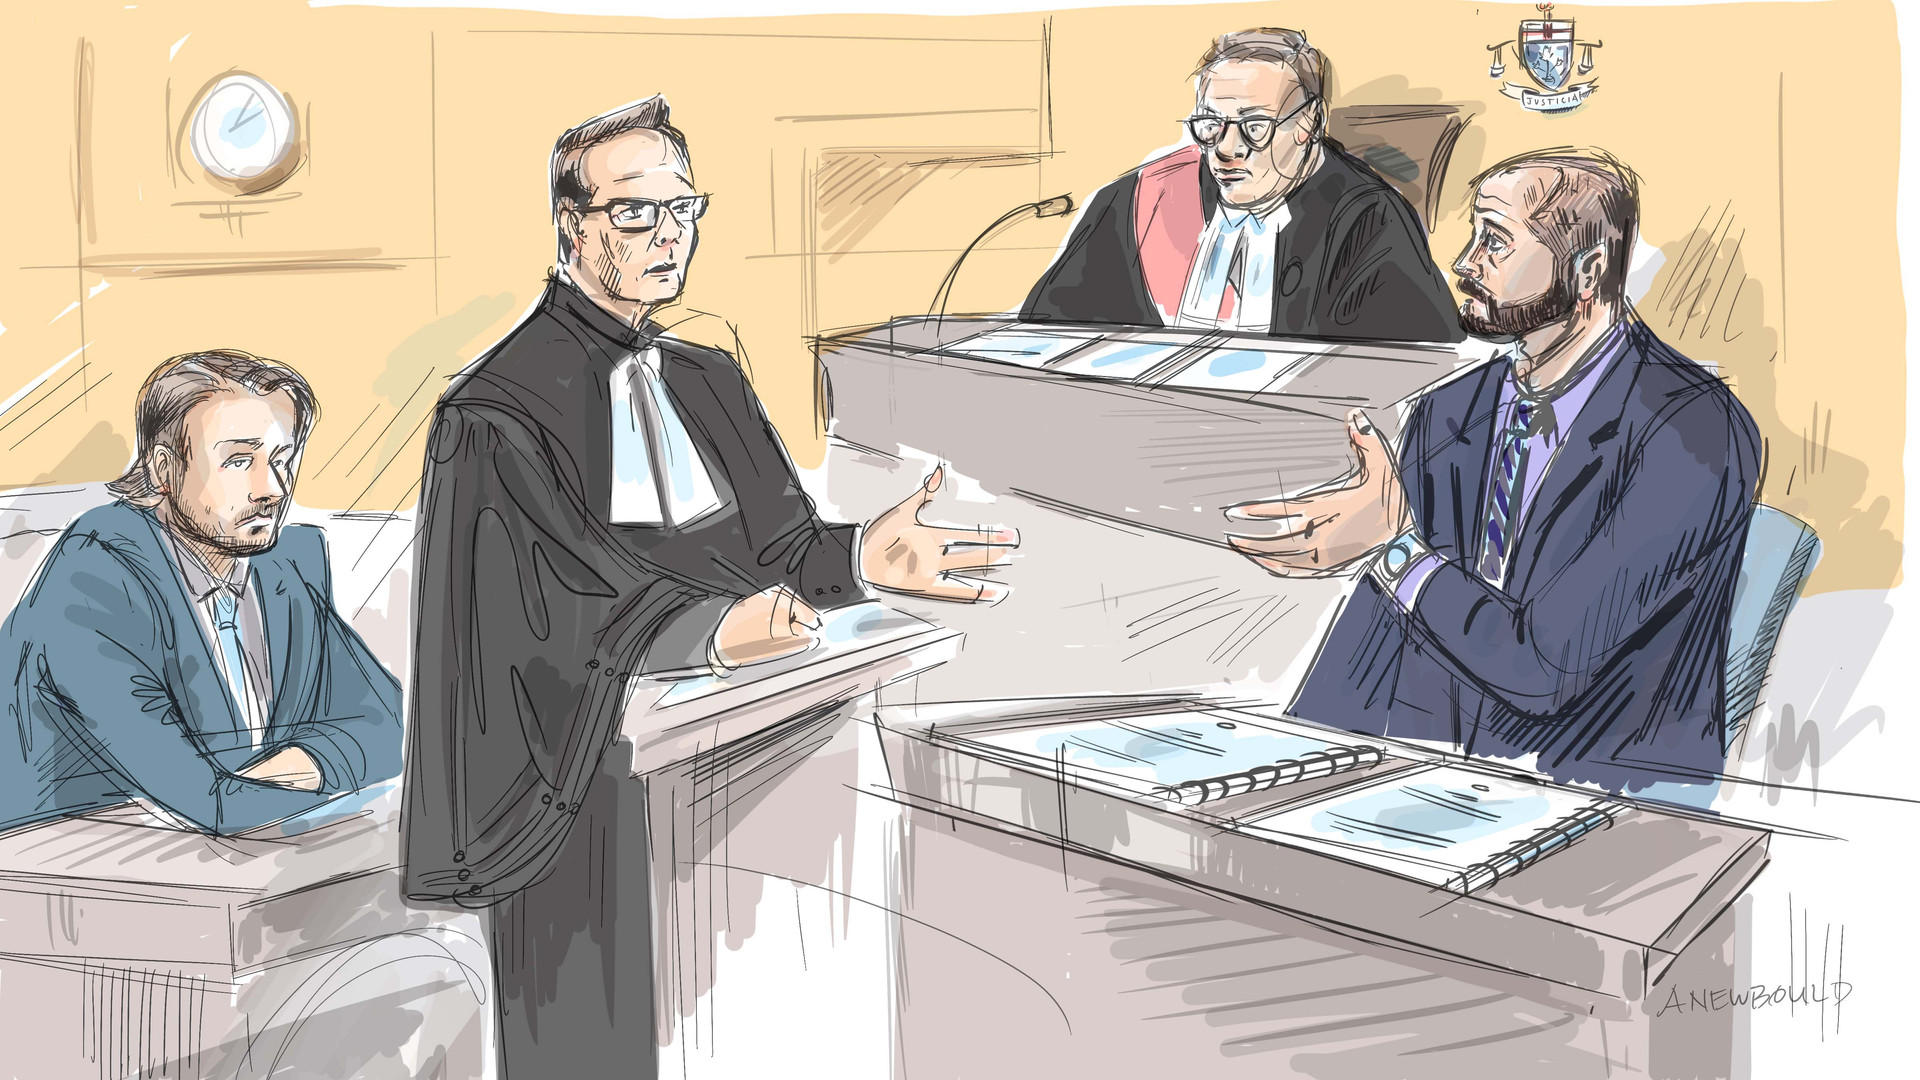 Michael_Theriault trial Oshawa